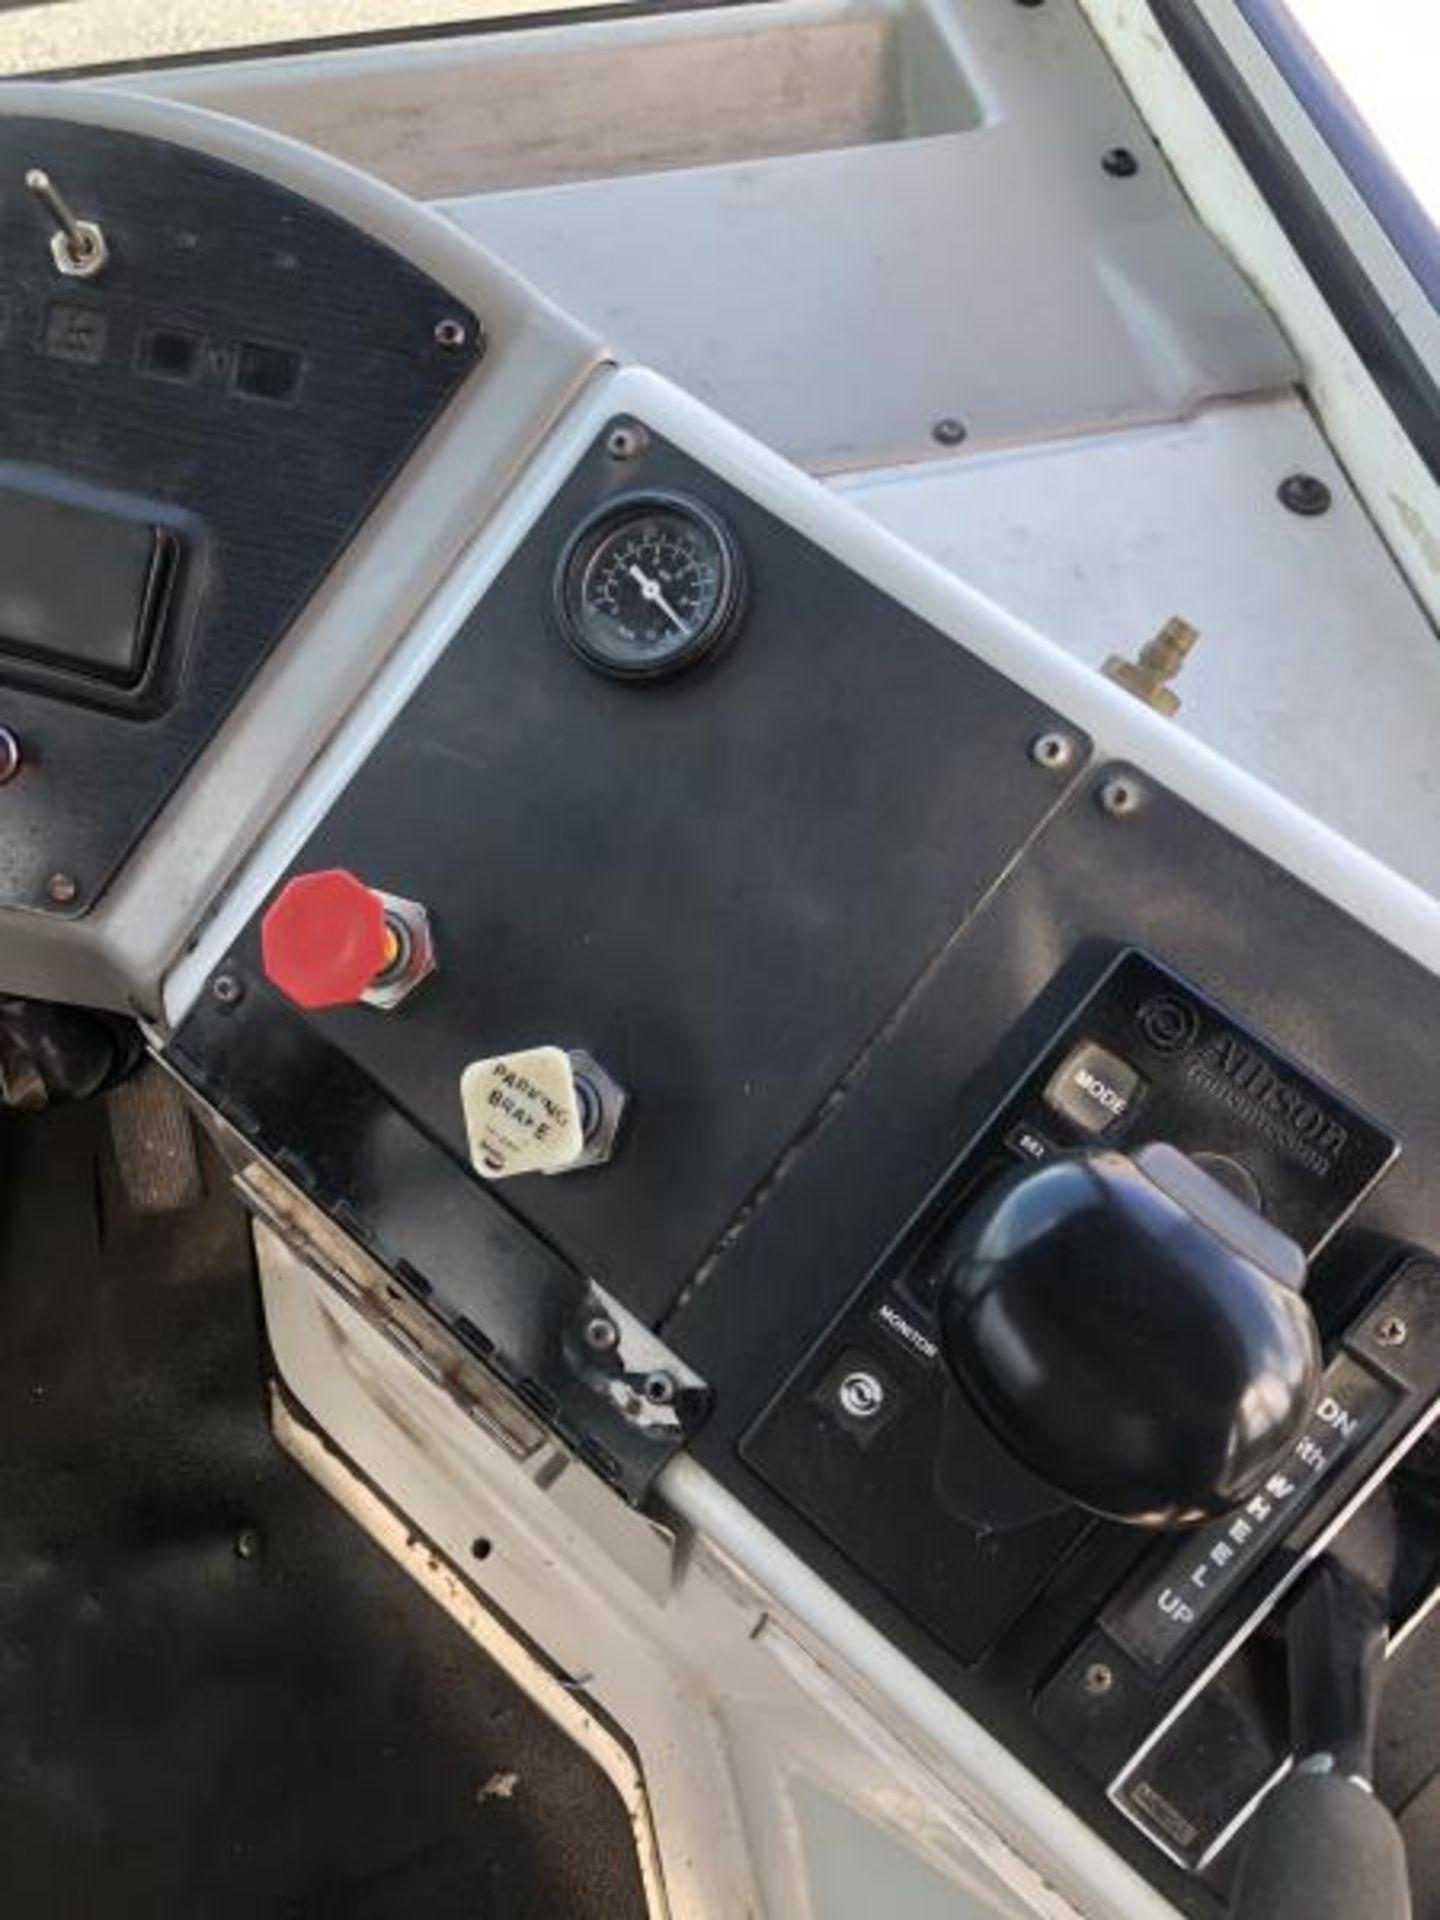 2015 Kalmar Ottawa 4x2 Yard Truck , SN: 338837 3,239.3 Hours, 3,125 Miles - Image 30 of 32